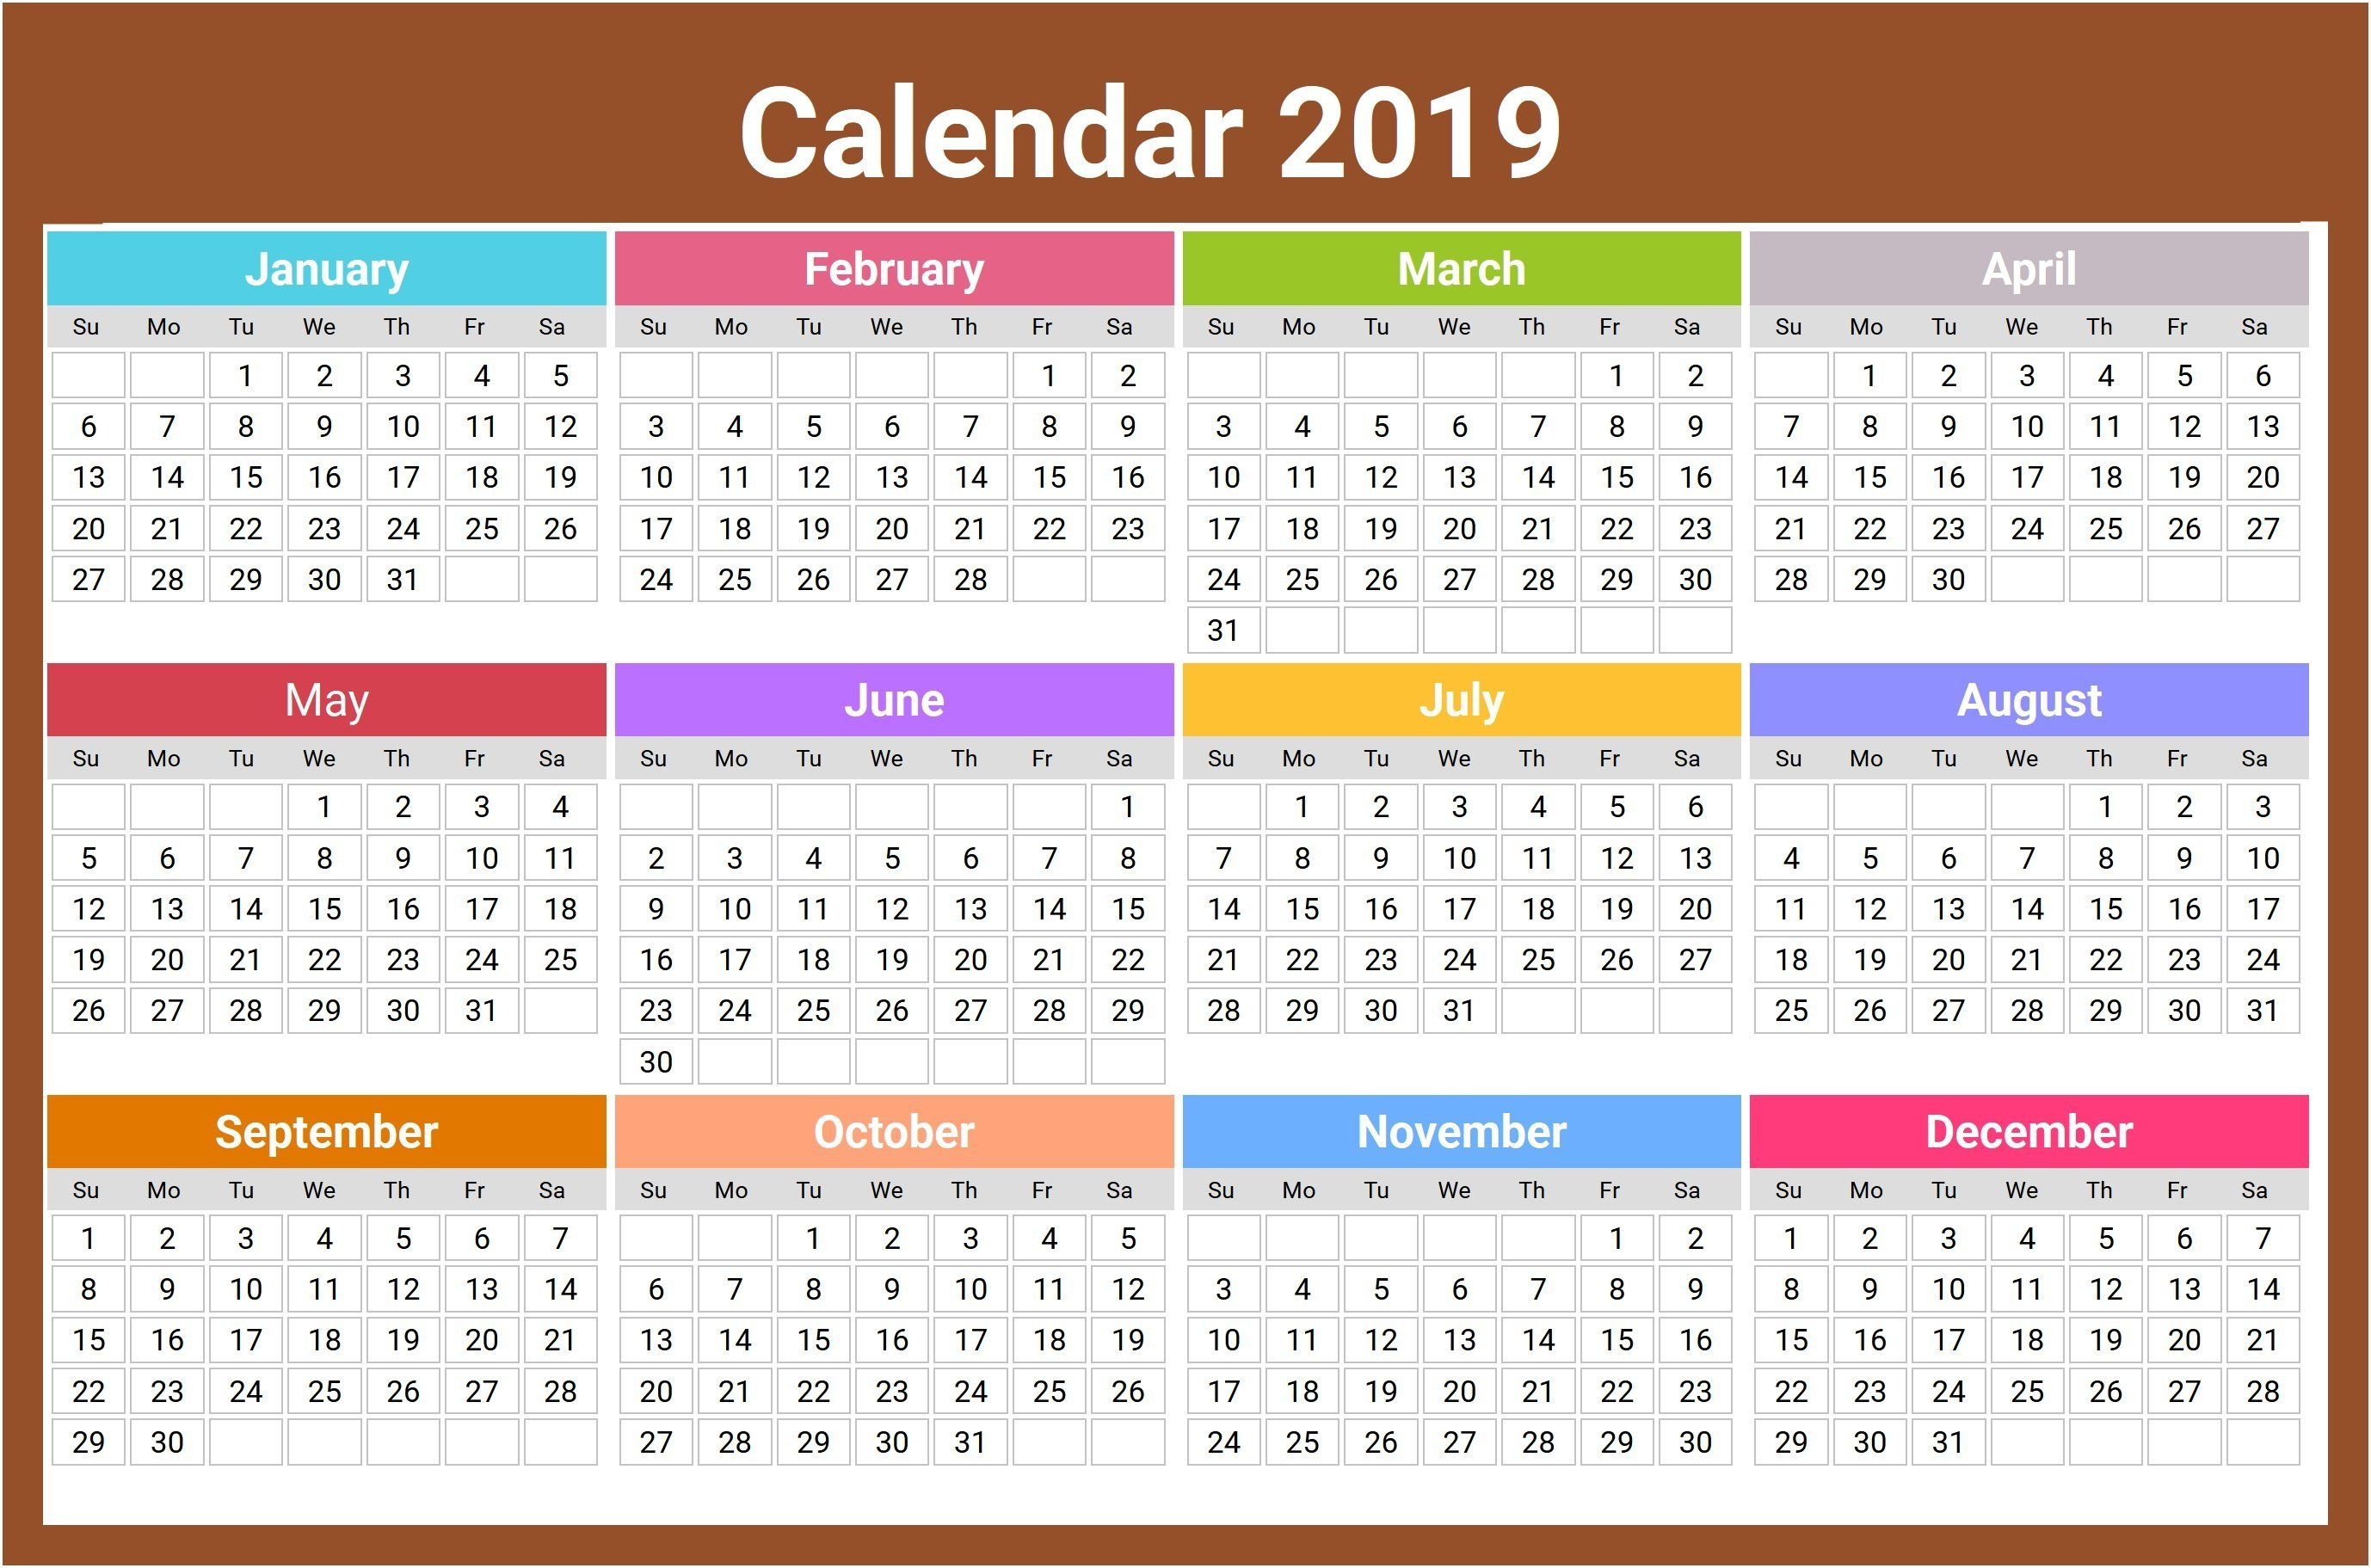 2019 Ka Calendar To Download Or Print   Americanwomanmag Calendar 2019 Ka